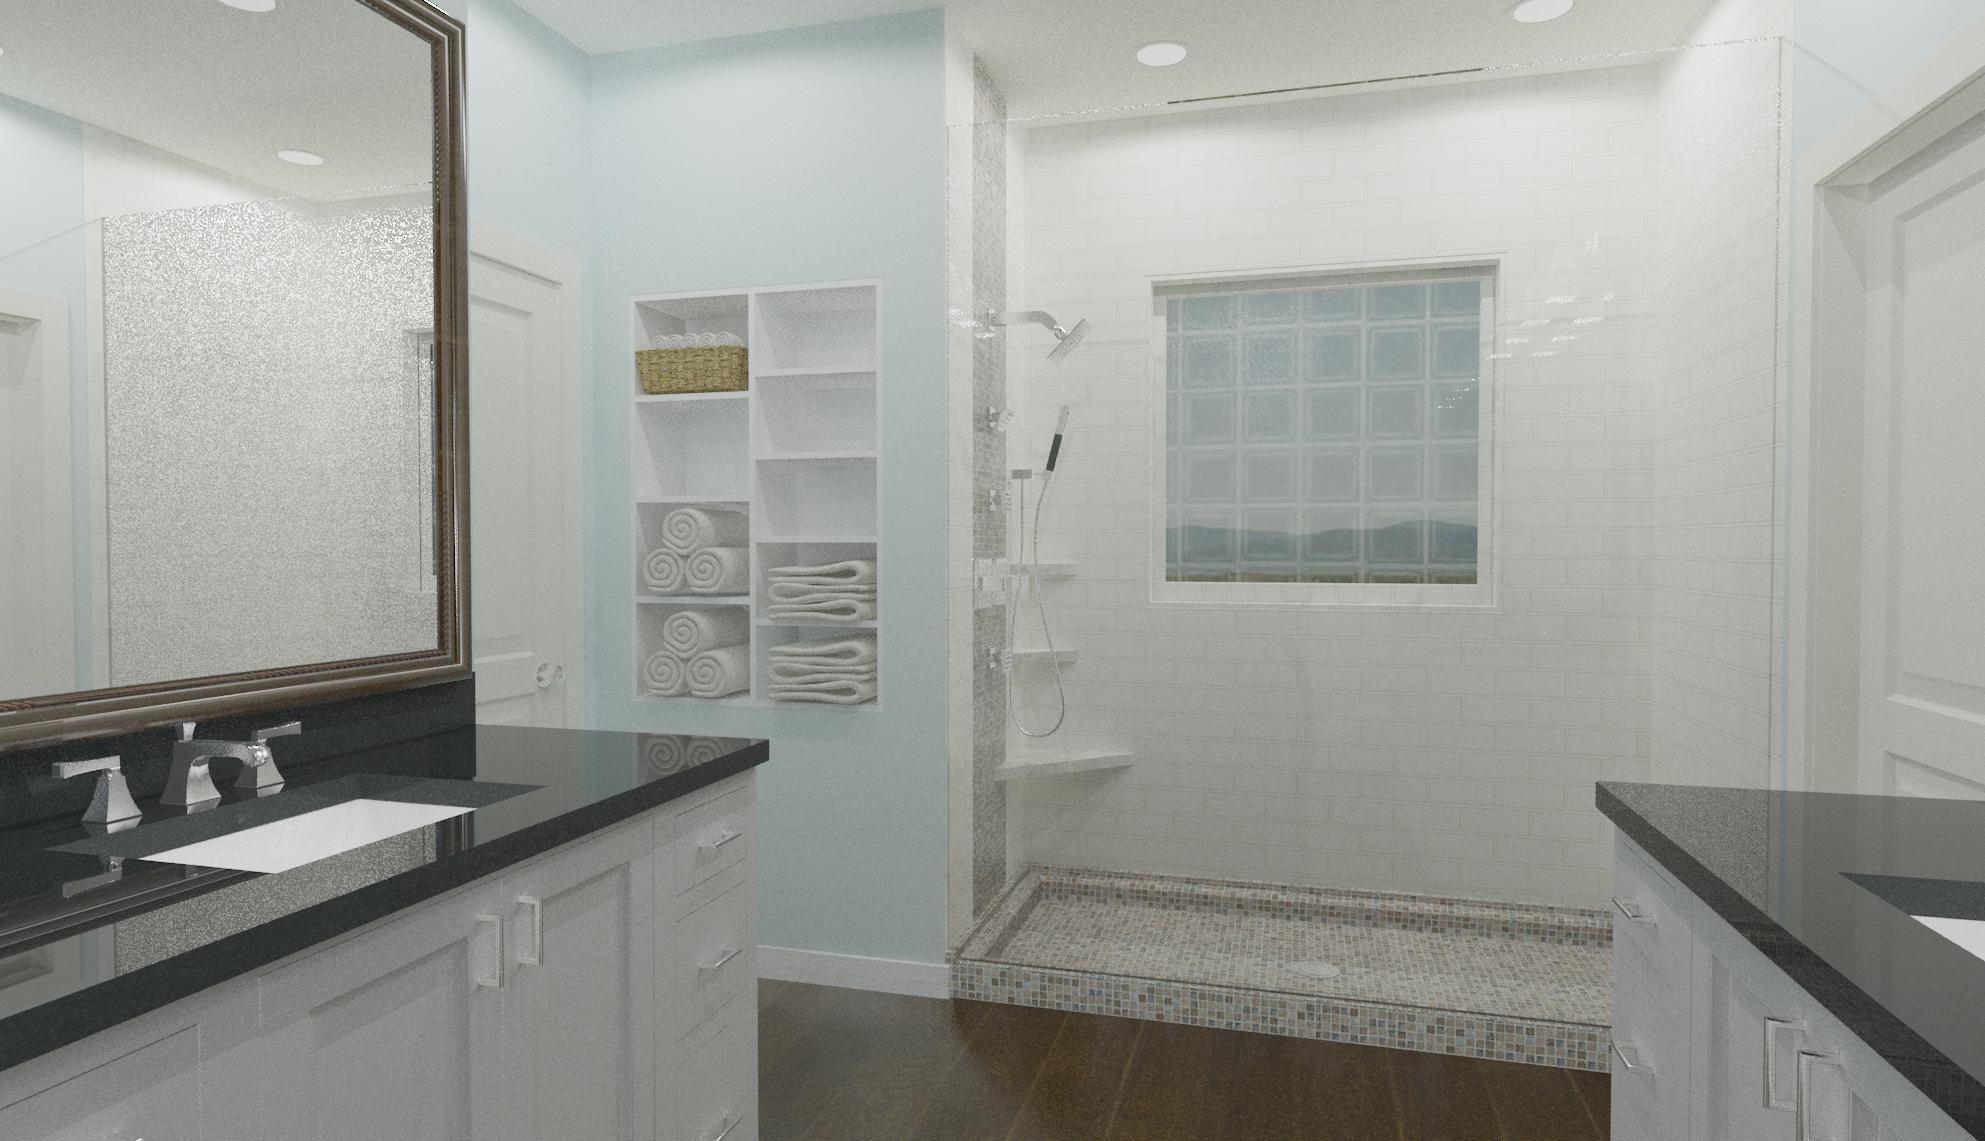 Haviland Res Opt3 Rendered Bath view 02 prelim.jpg